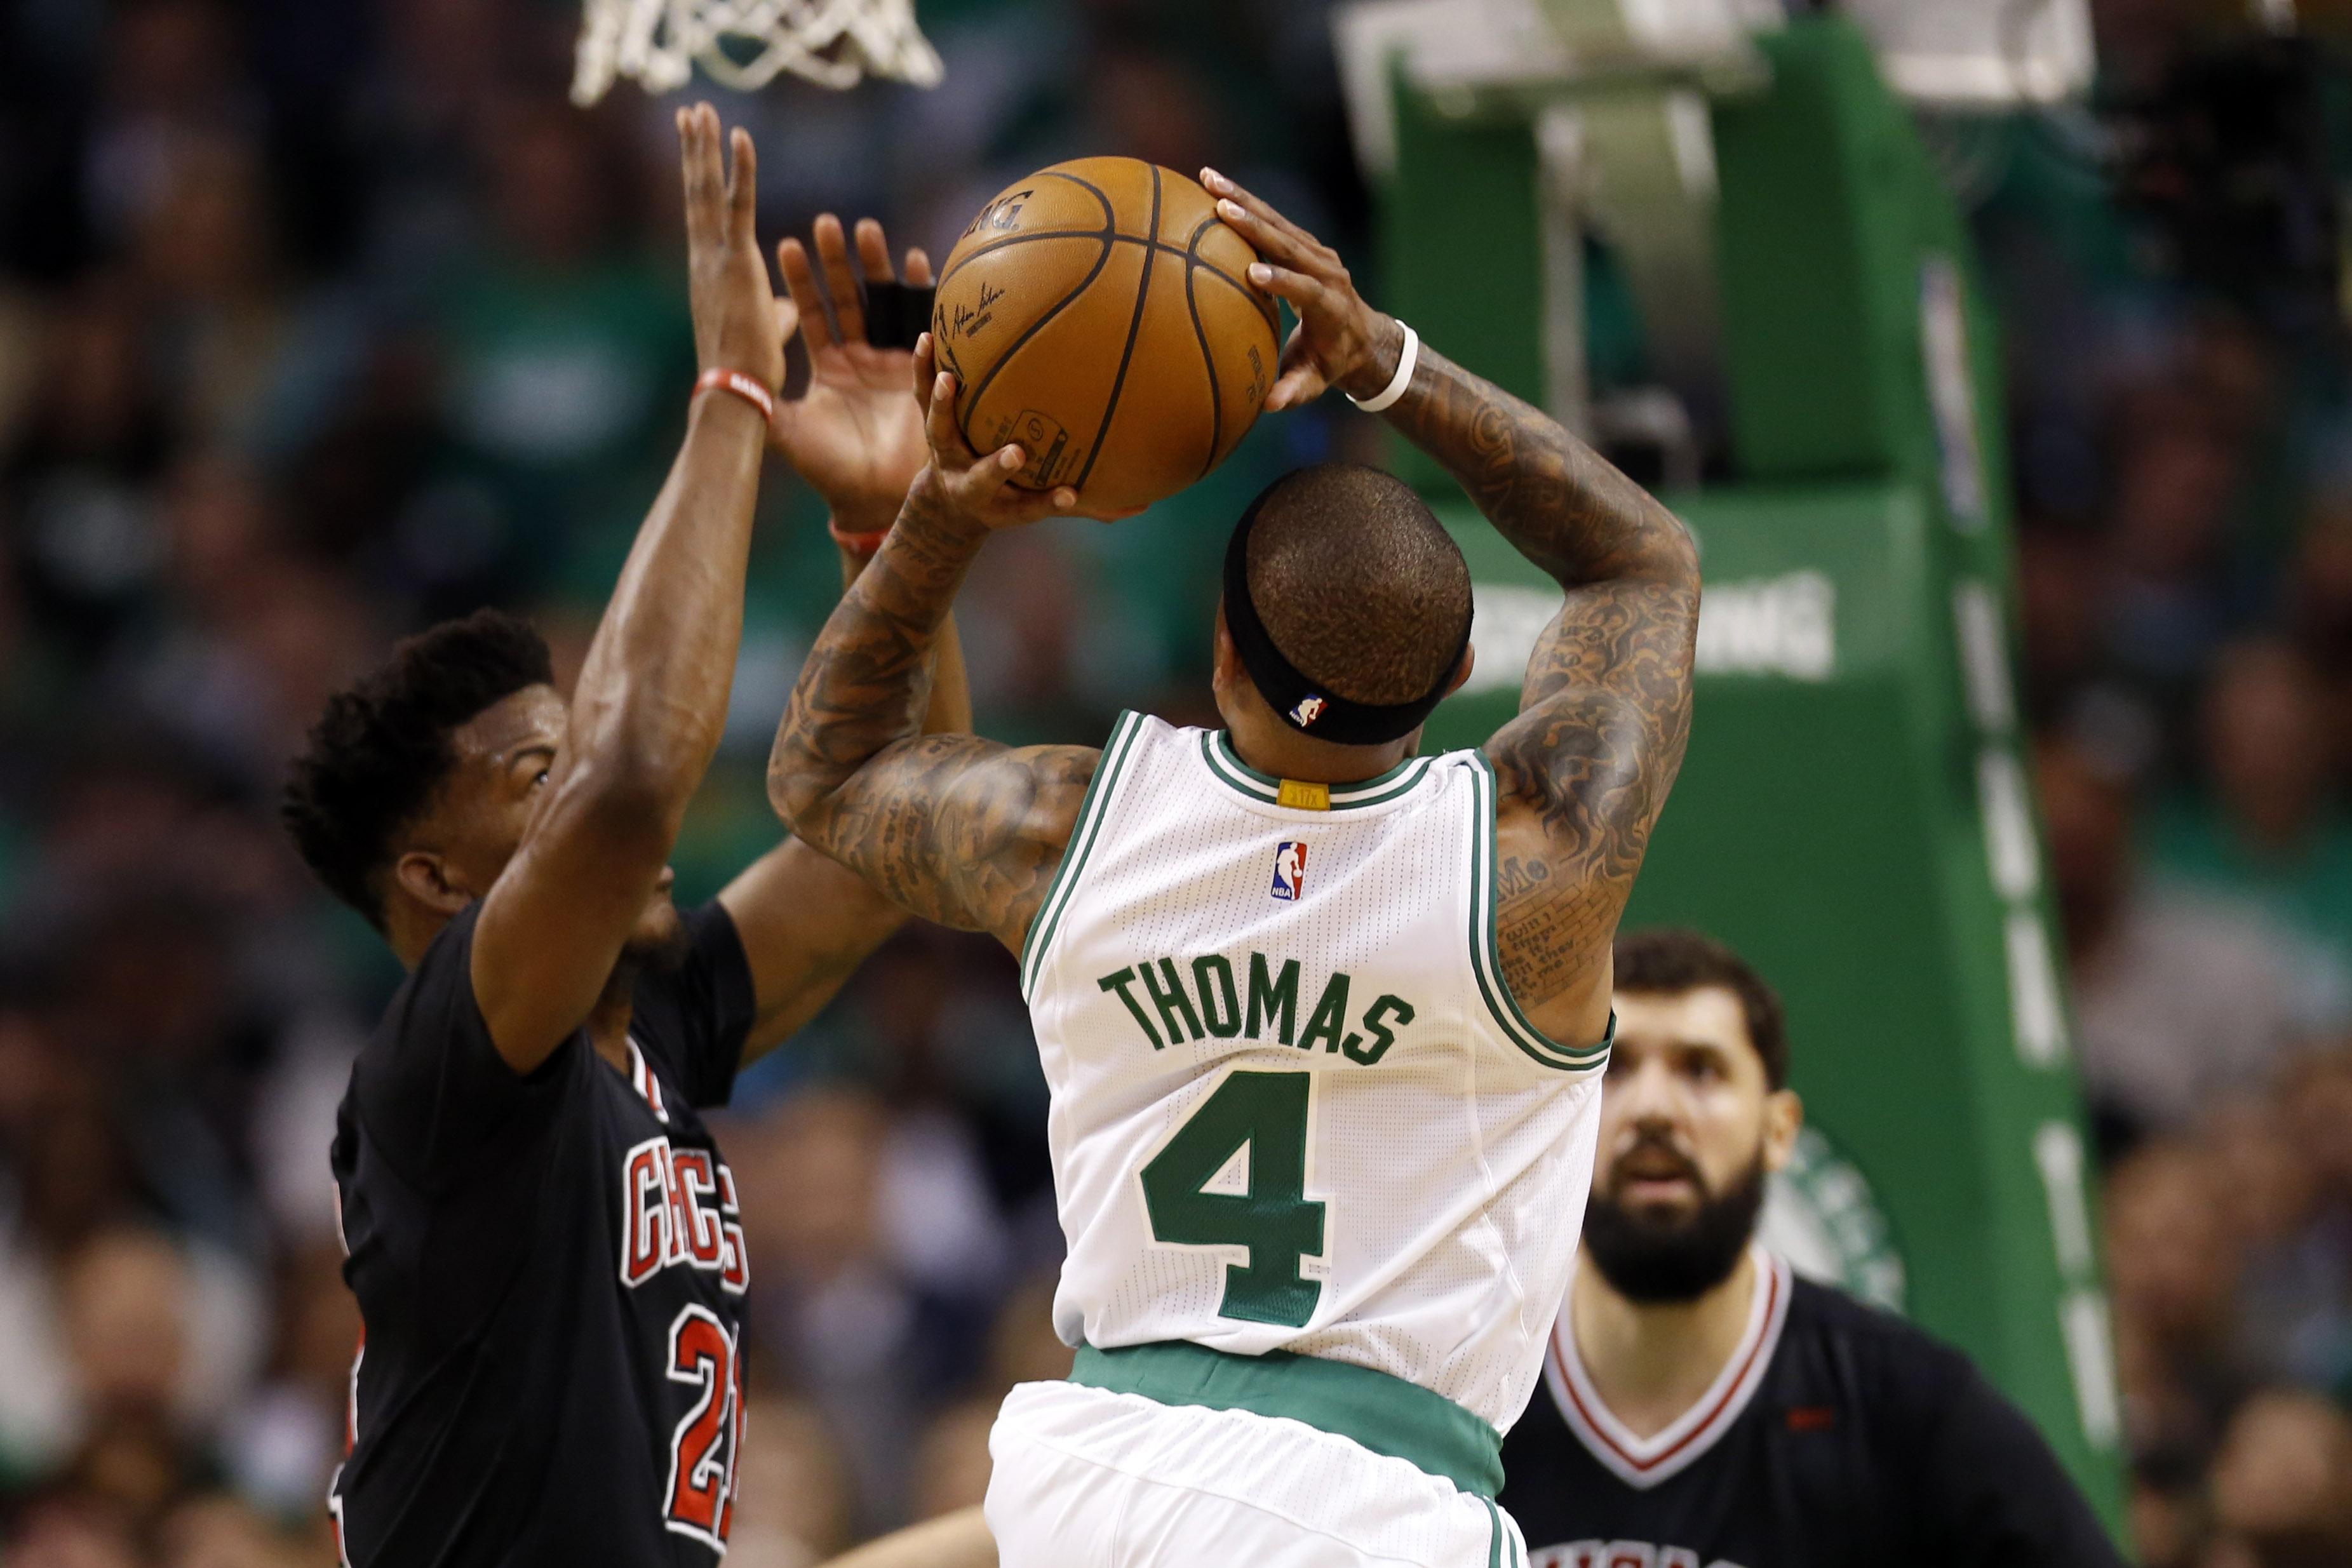 10019223-nba-playoffs-chicago-bulls-at-boston-celtics